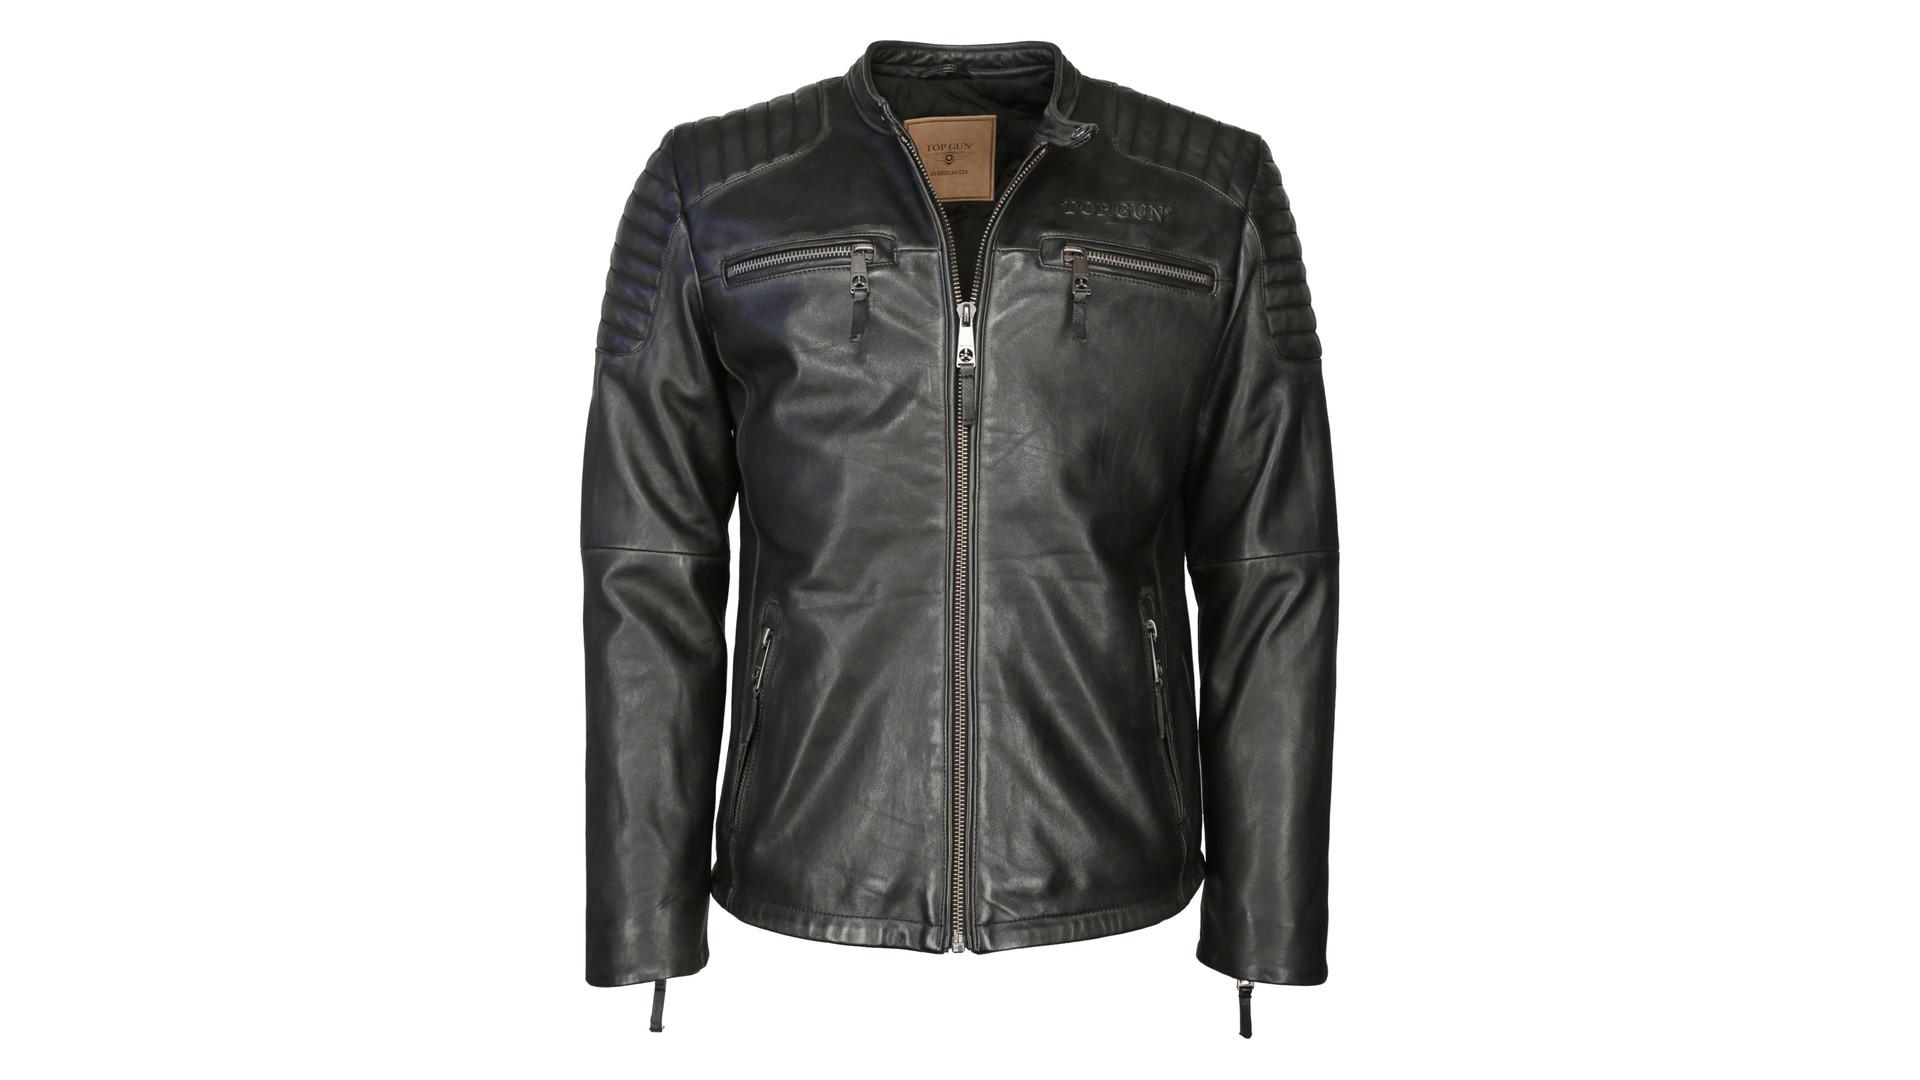 Top Gun TGLJ-001 vintage black